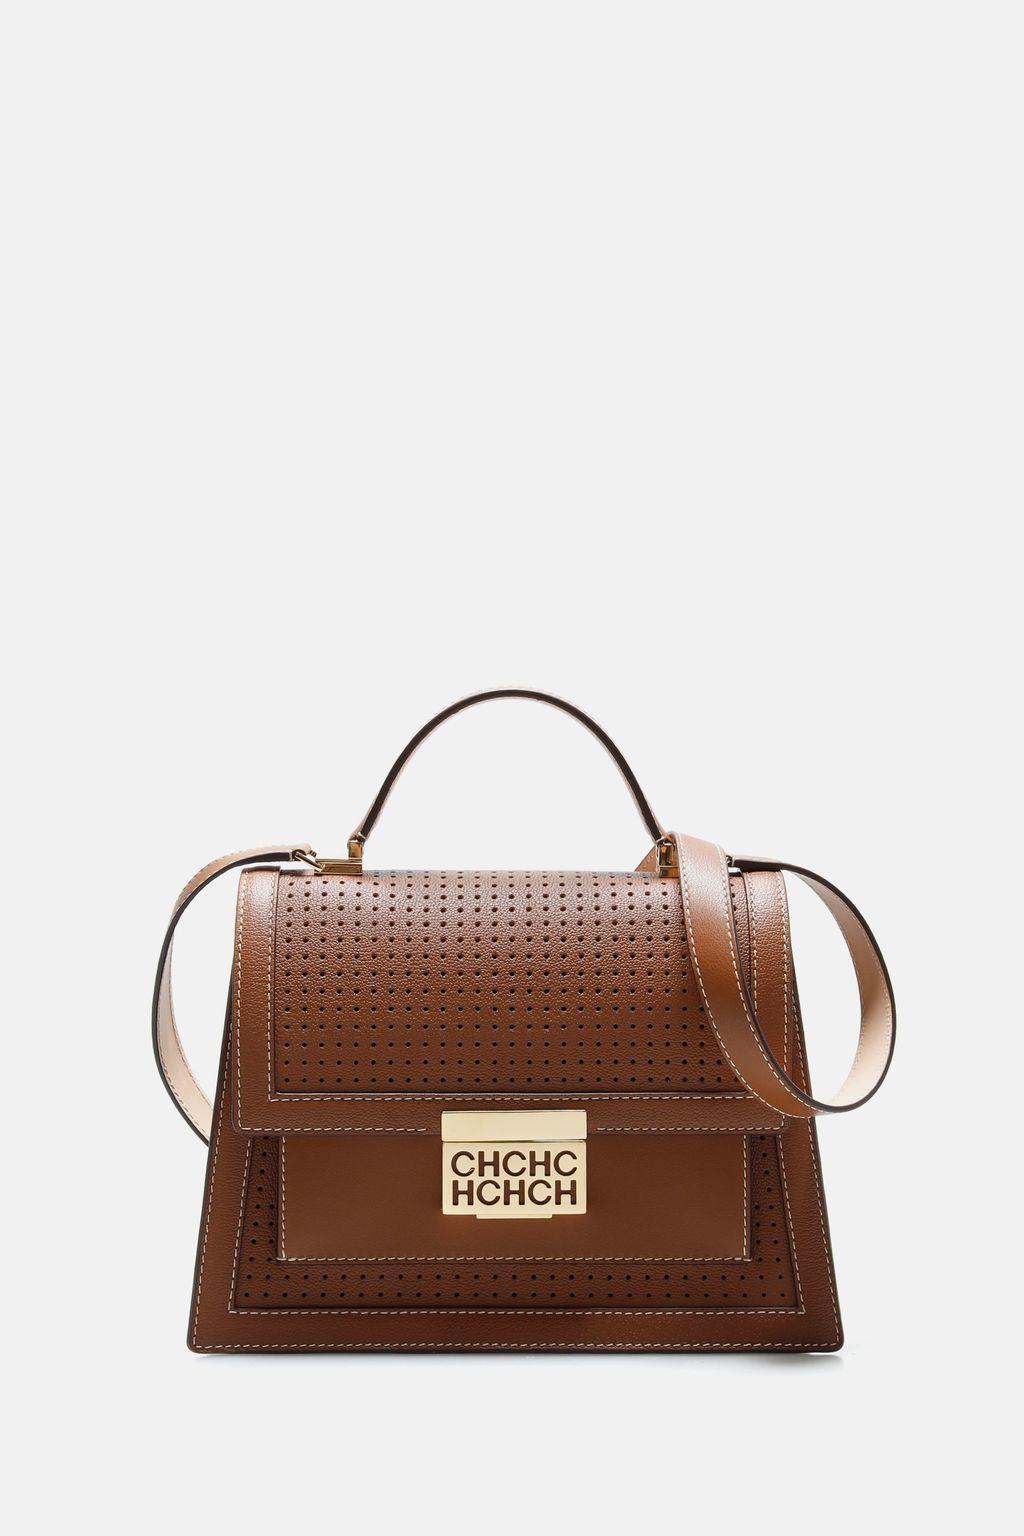 Carry on Satchel | Medium cross body bag